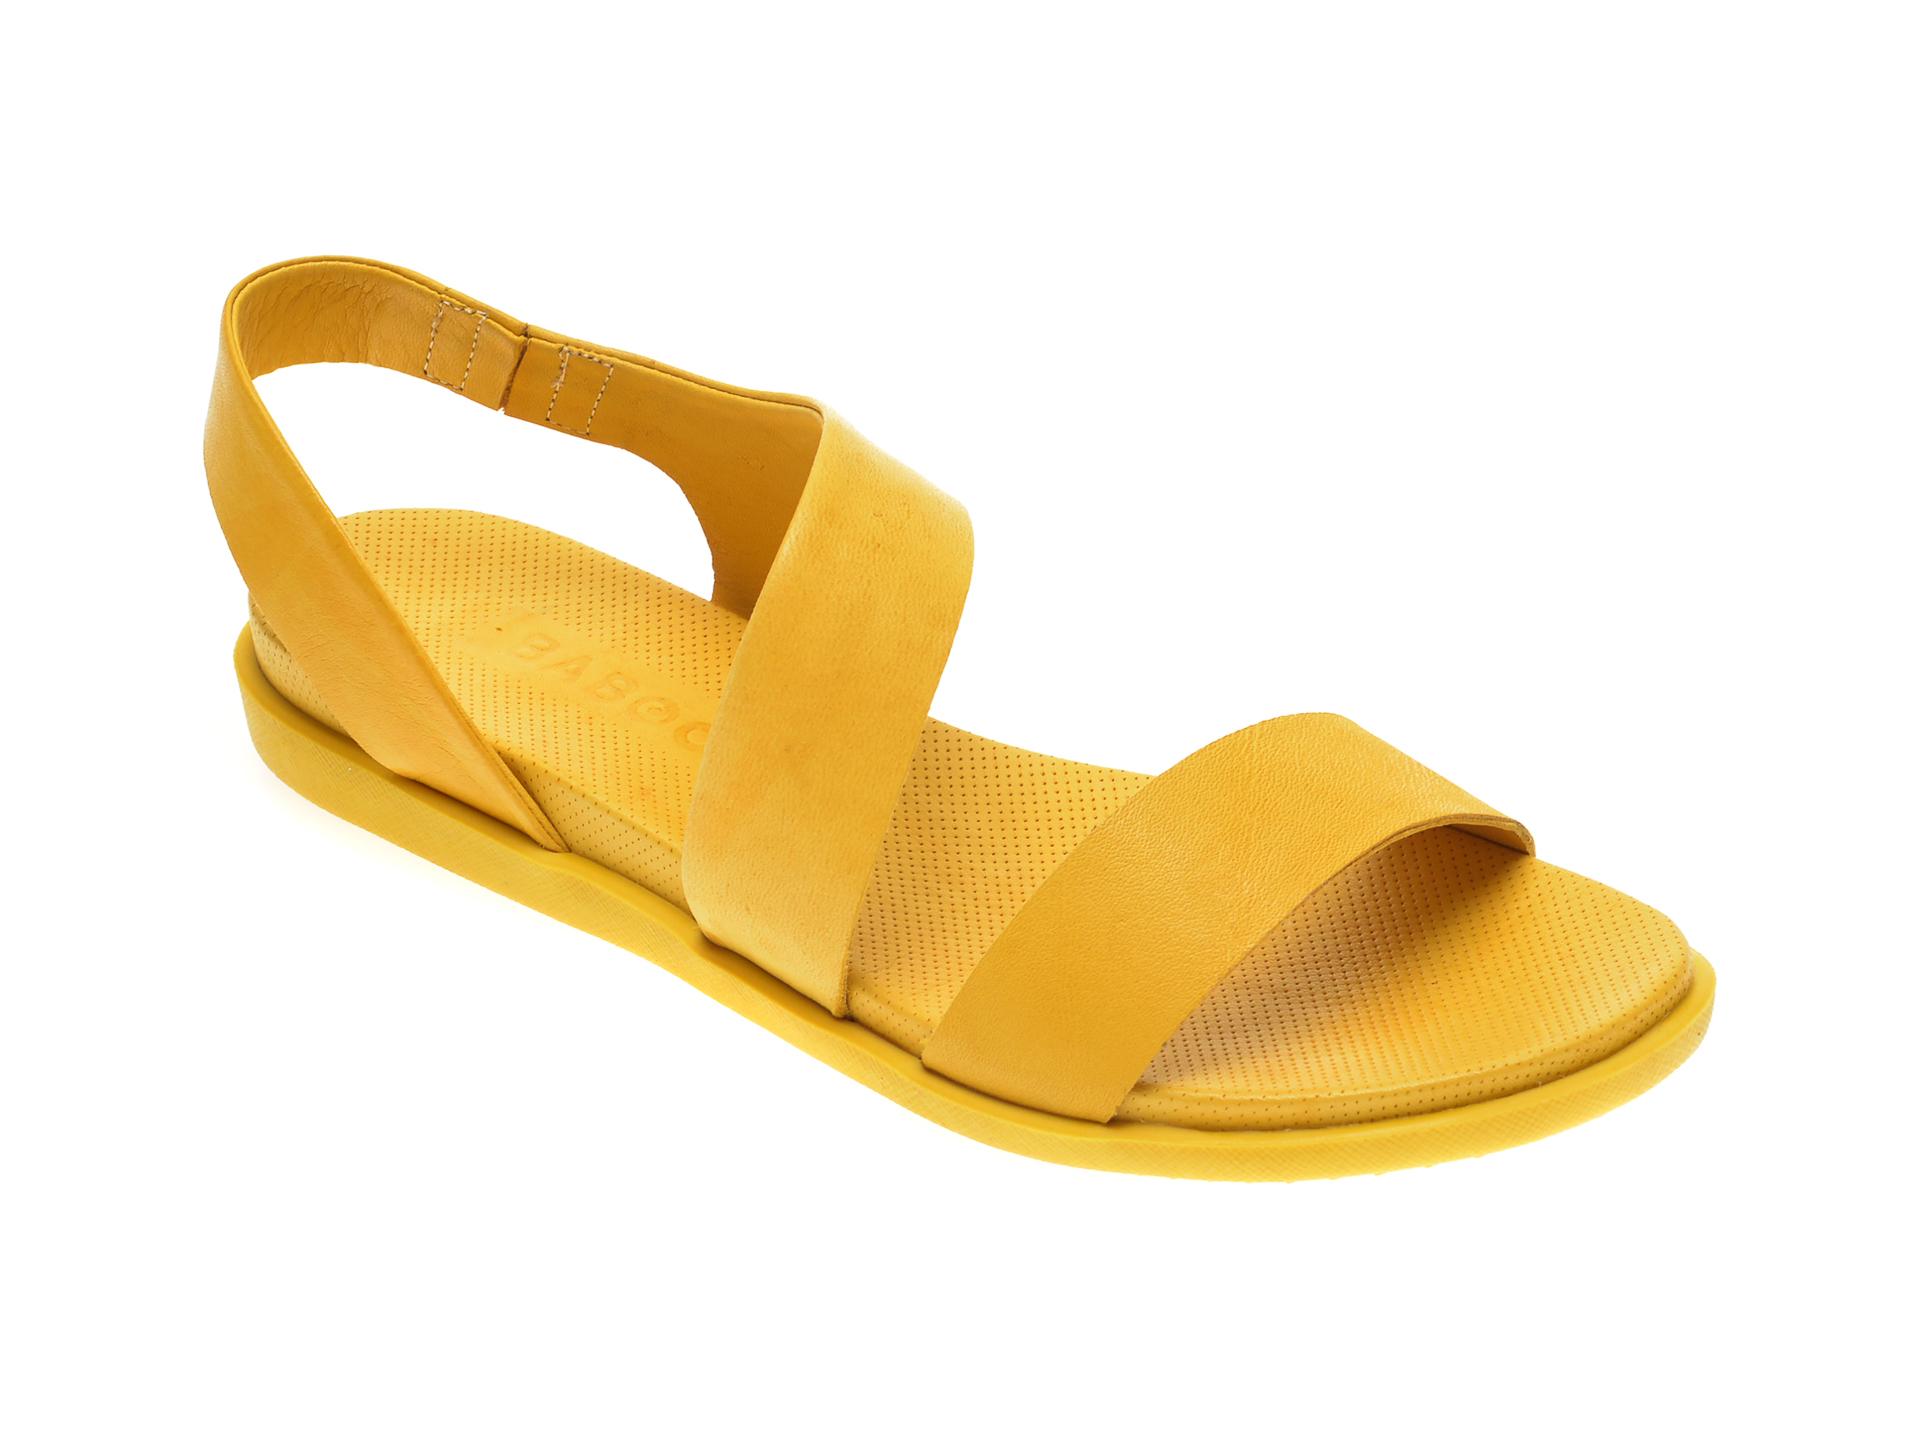 Sandale BABOOS galbene, 1402, din piele naturala